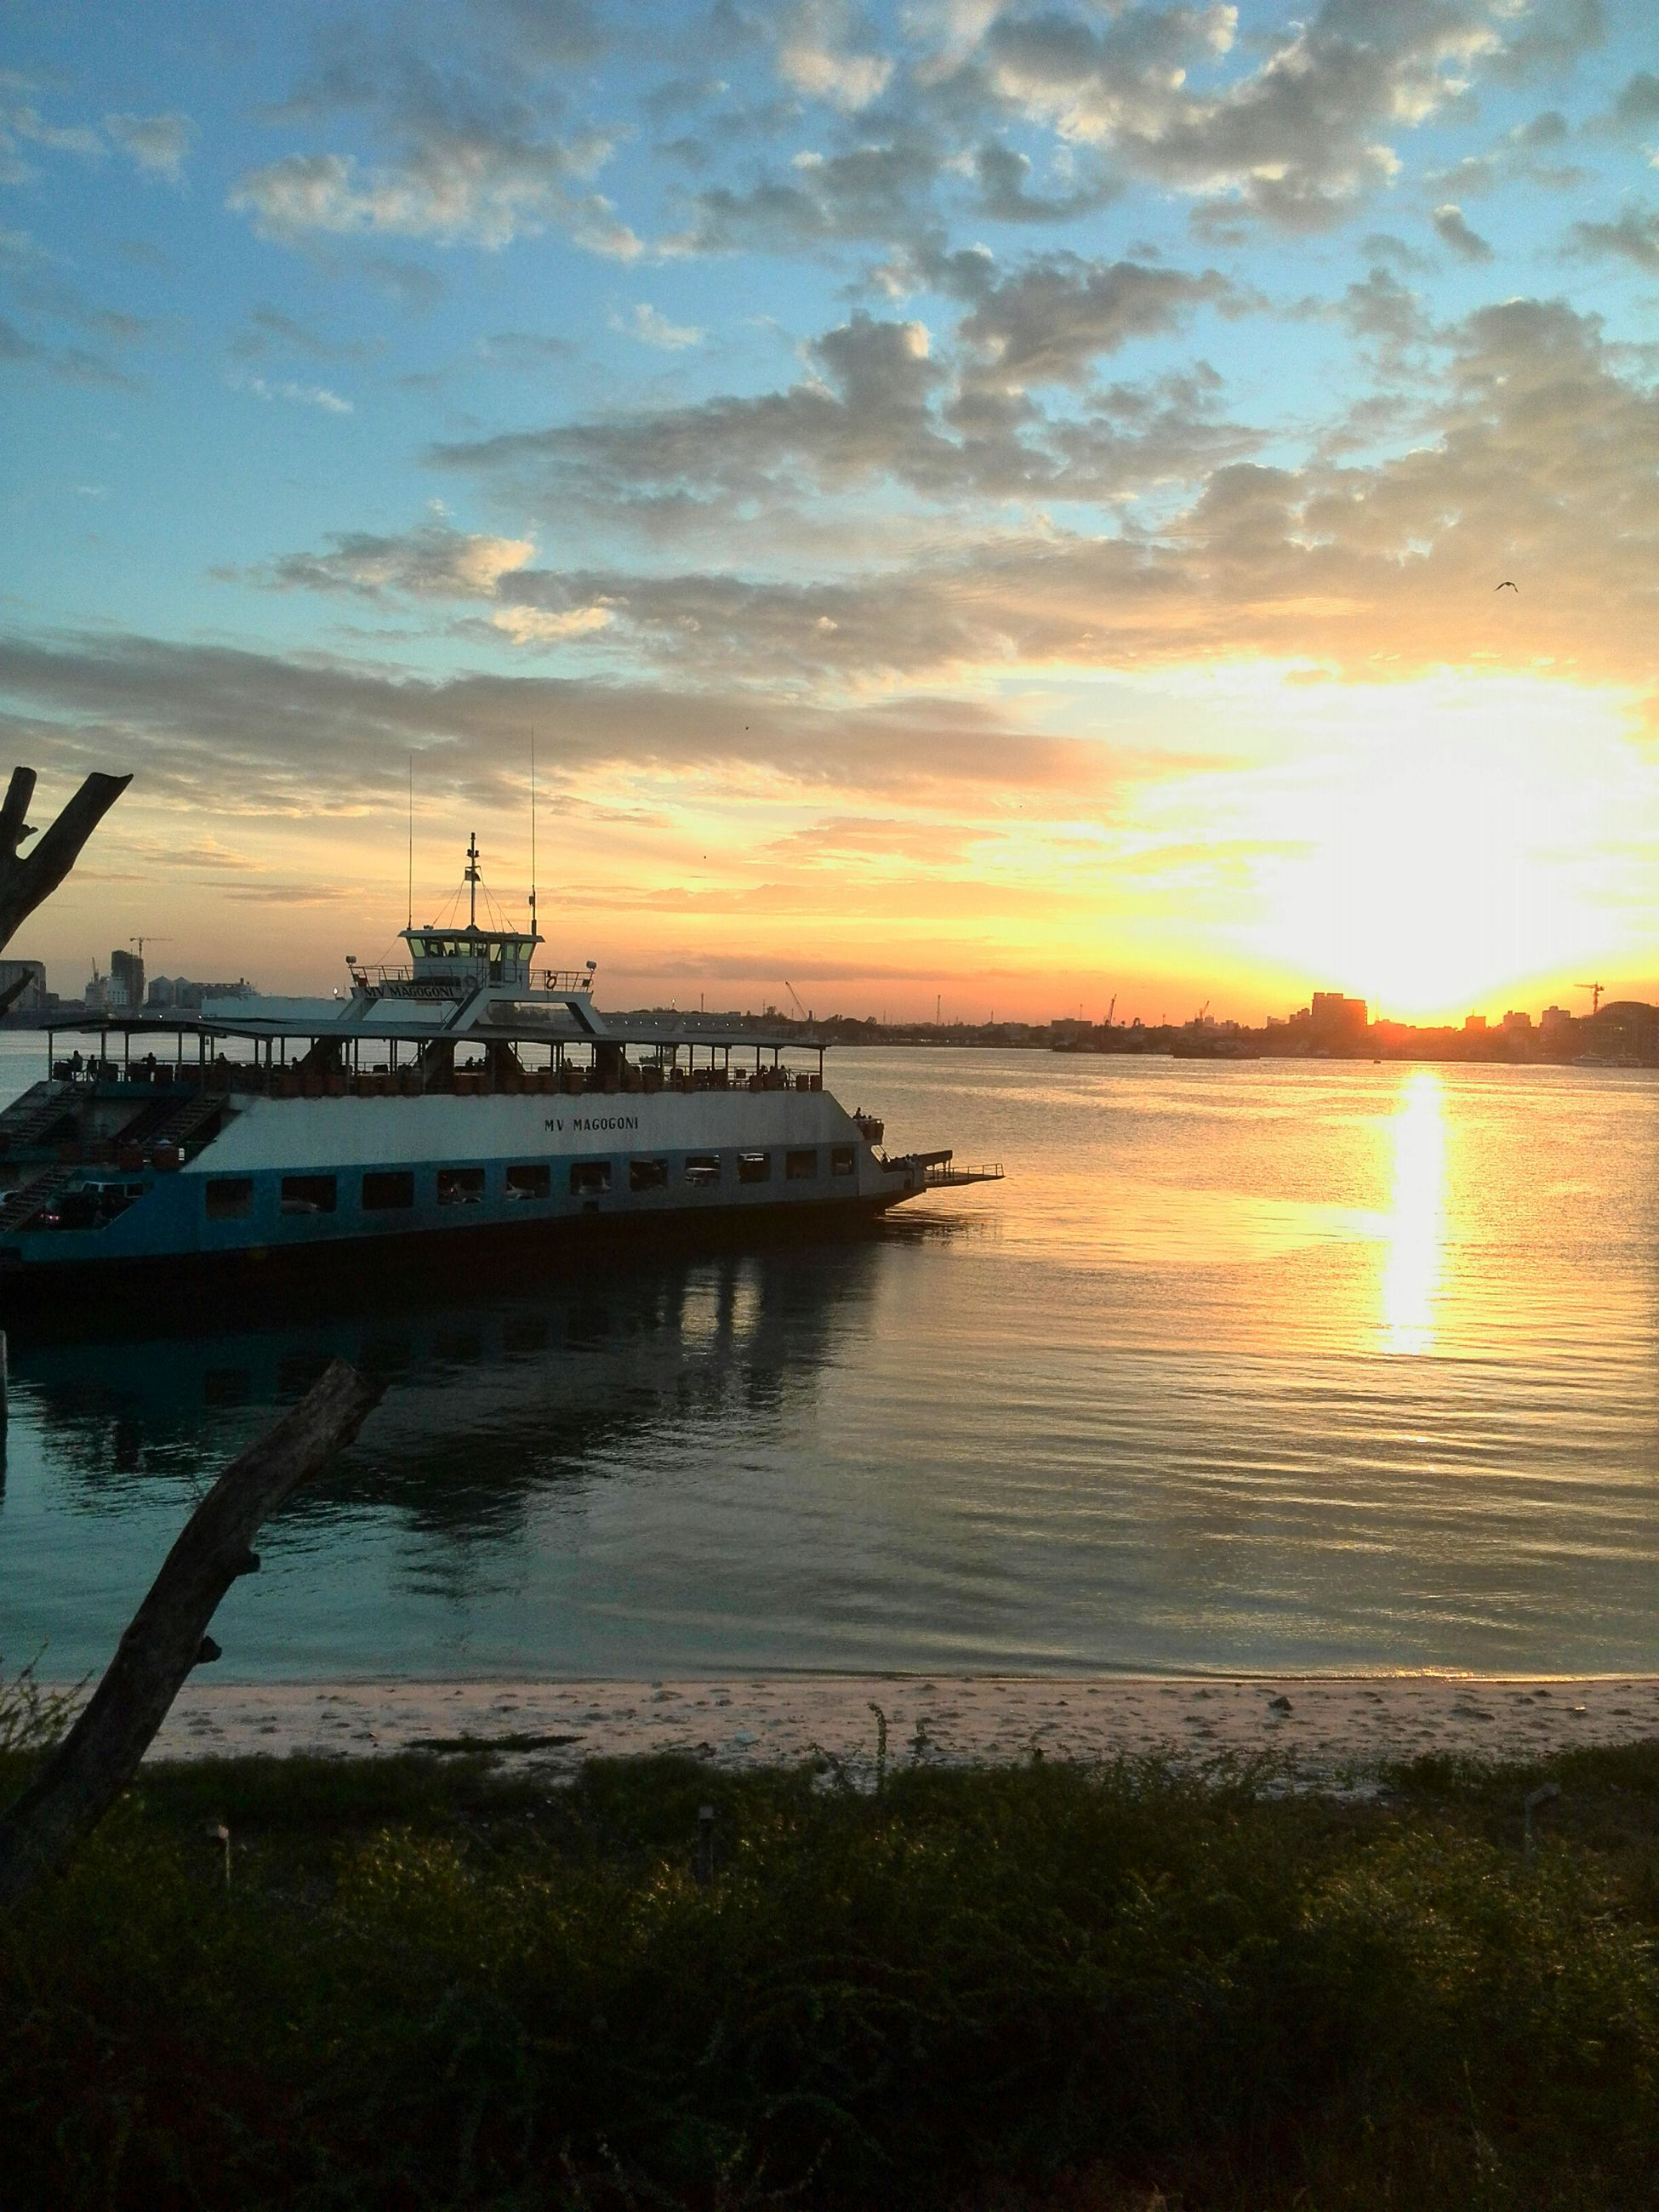 water, sunset, sun, sky, reflection, scenics, tranquil scene, sea, beauty in nature, tranquility, cloud - sky, nature, orange color, sunlight, nautical vessel, idyllic, lake, horizon over water, sunbeam, boat